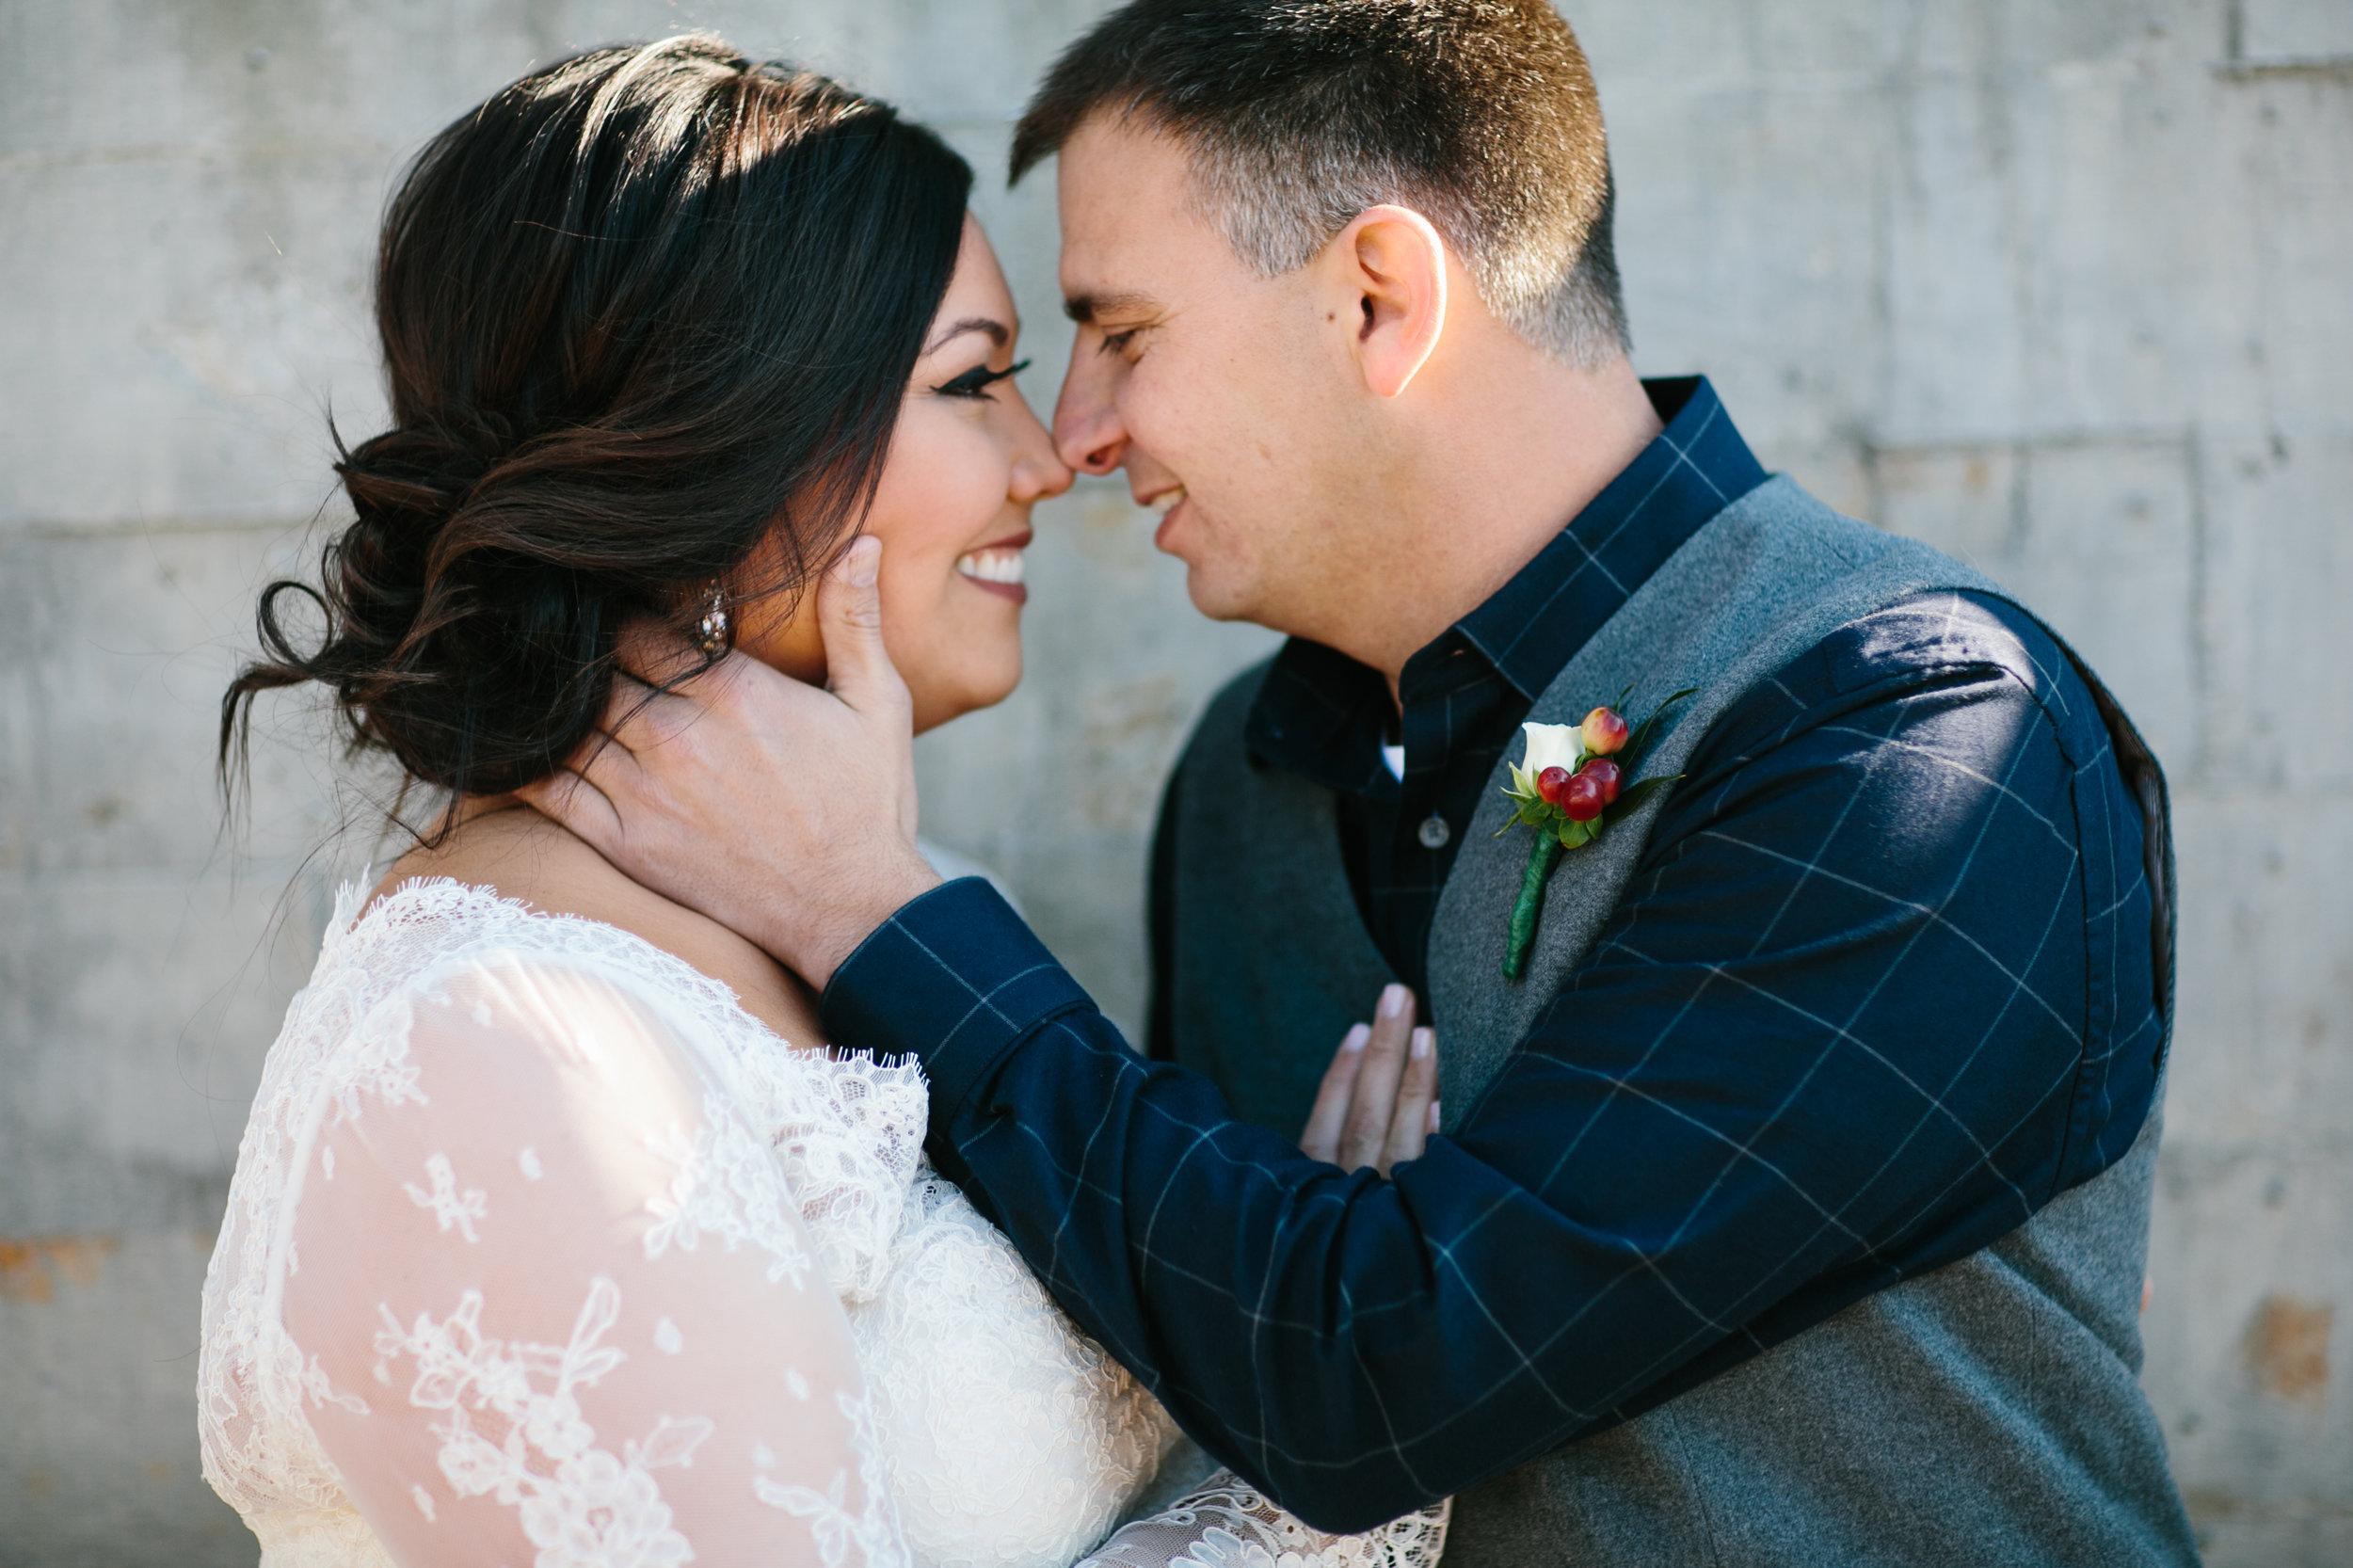 Lauren_Jeremy_Standard_Wedding_Knoxville_Abigail_Malone_Photography_FIlm-228.jpg